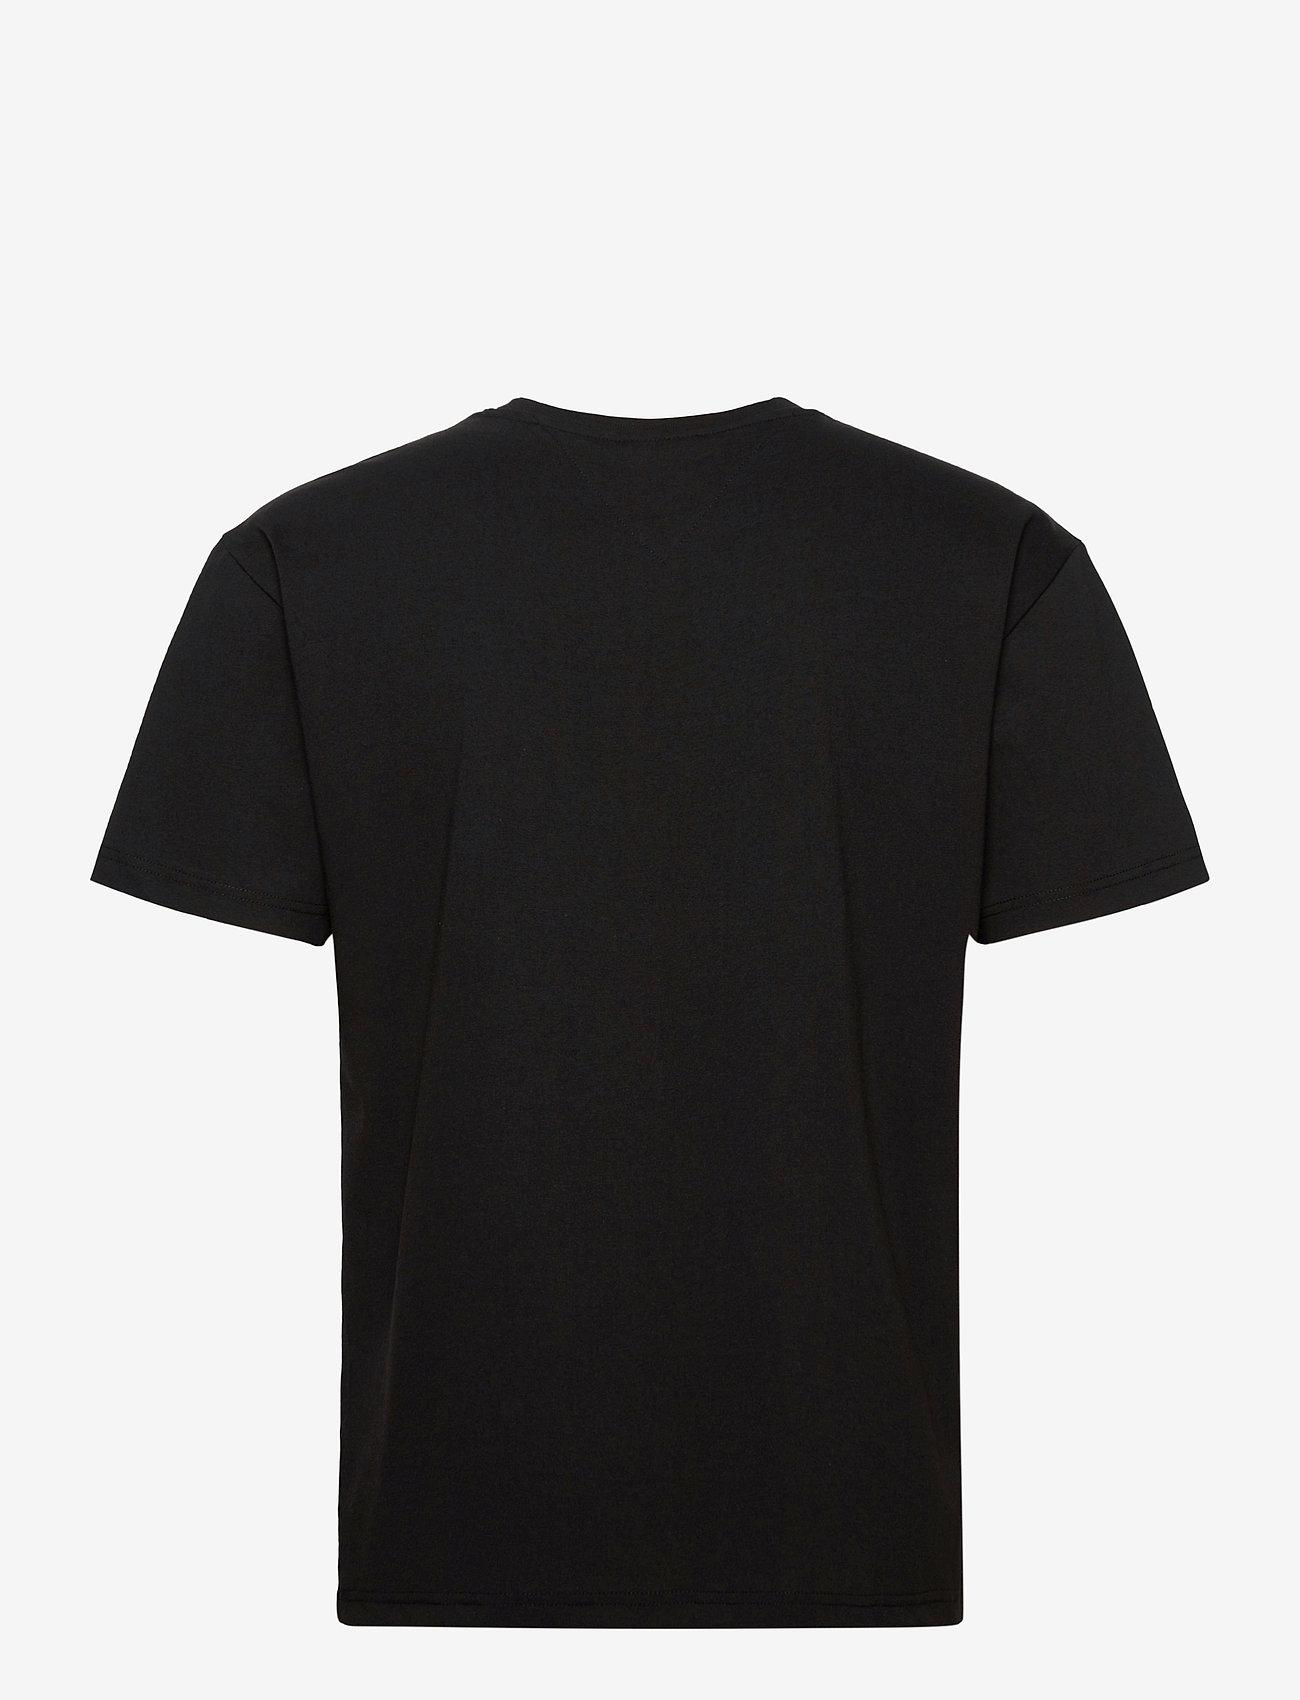 Tommy Jeans - TJM SHINE SMALL TEXT TEE C - basic t-shirts - black - 1